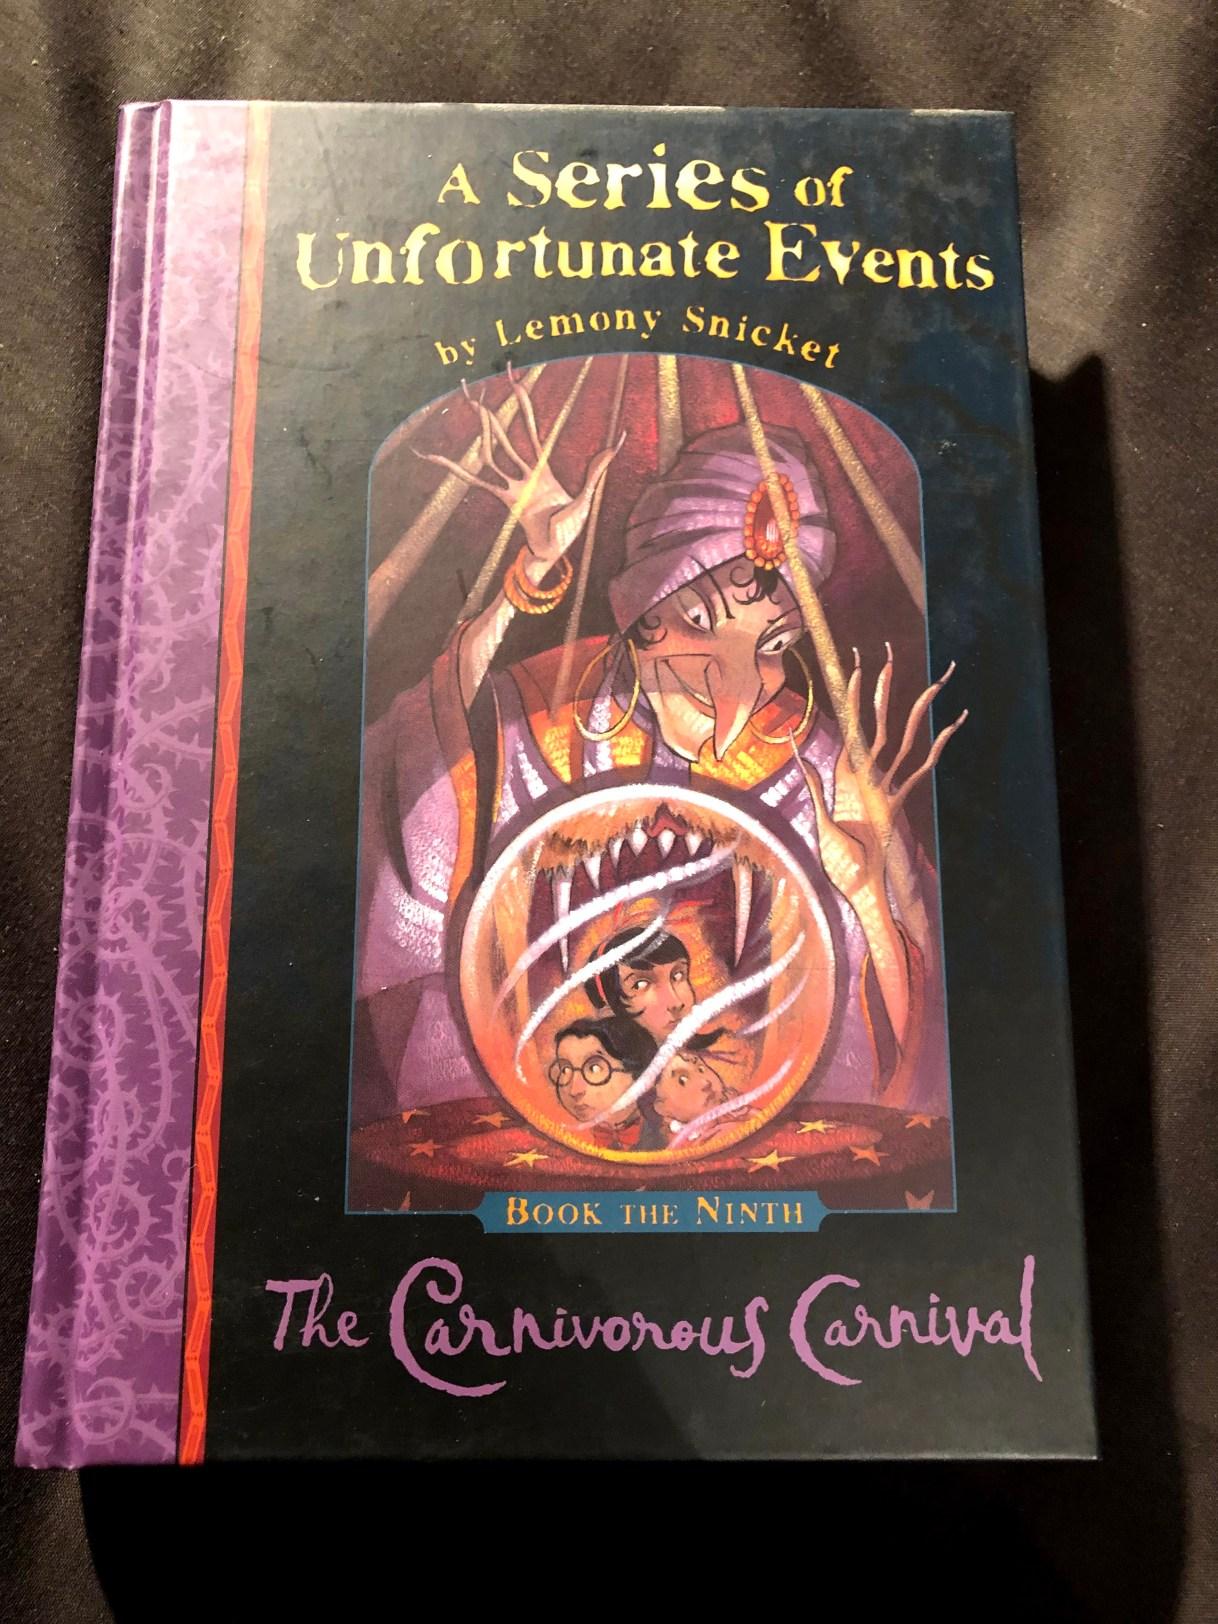 The Carnivorous Carnival by Lemony Snicket (Book 9) | Alternative-Read.com